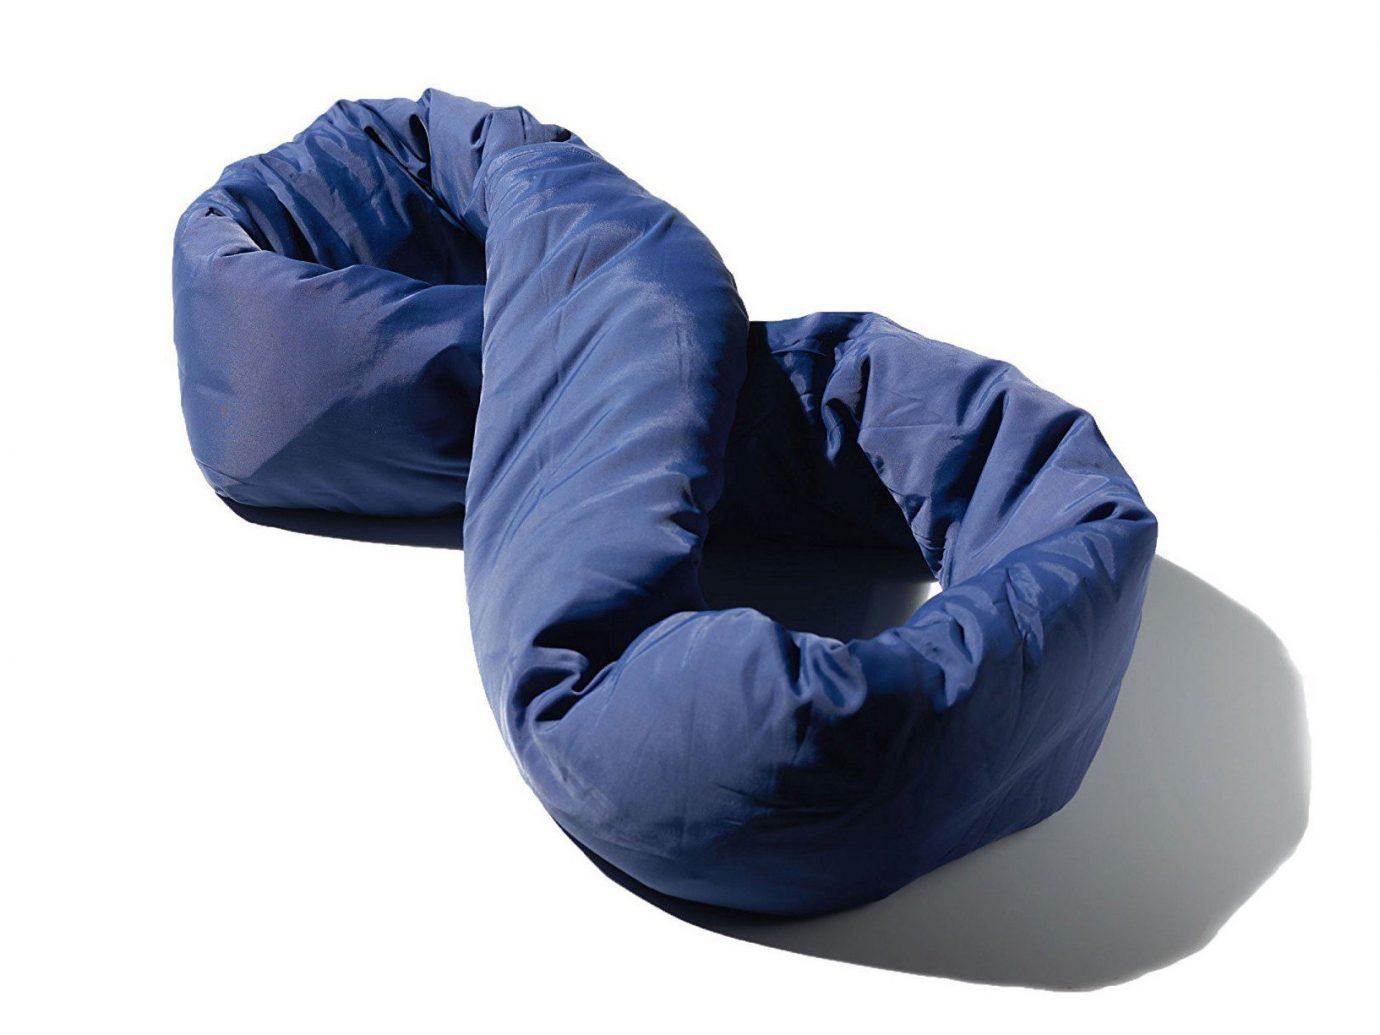 Flights Travel Shop person product design product electric blue blue sleeping bag comfort furniture